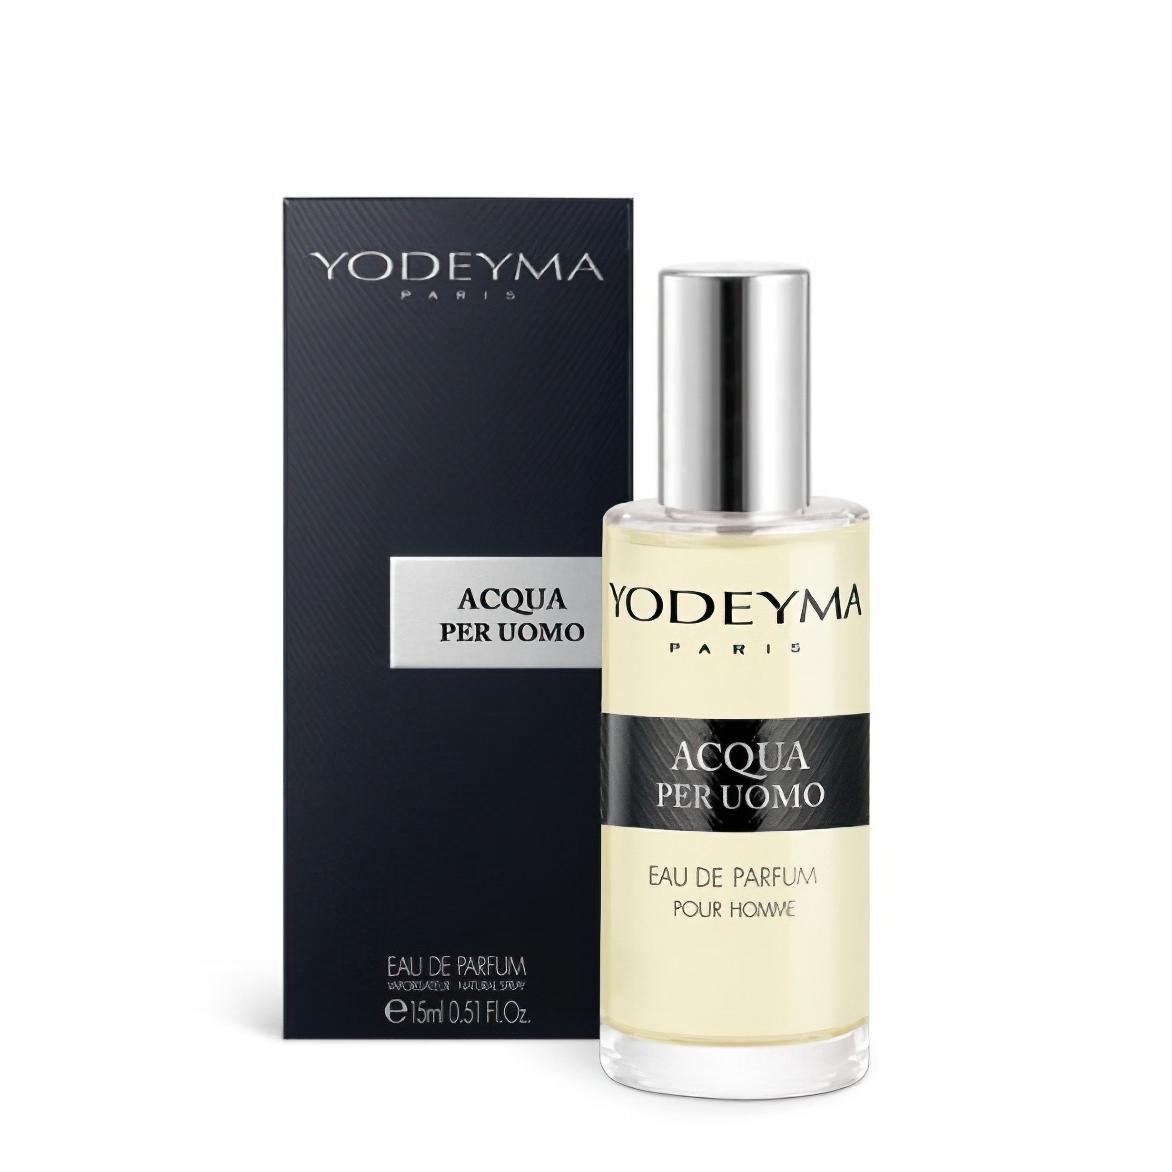 Pánský parfém ACQUA PER UOMO Eau de Parfum, chyprová - svěží, 15m